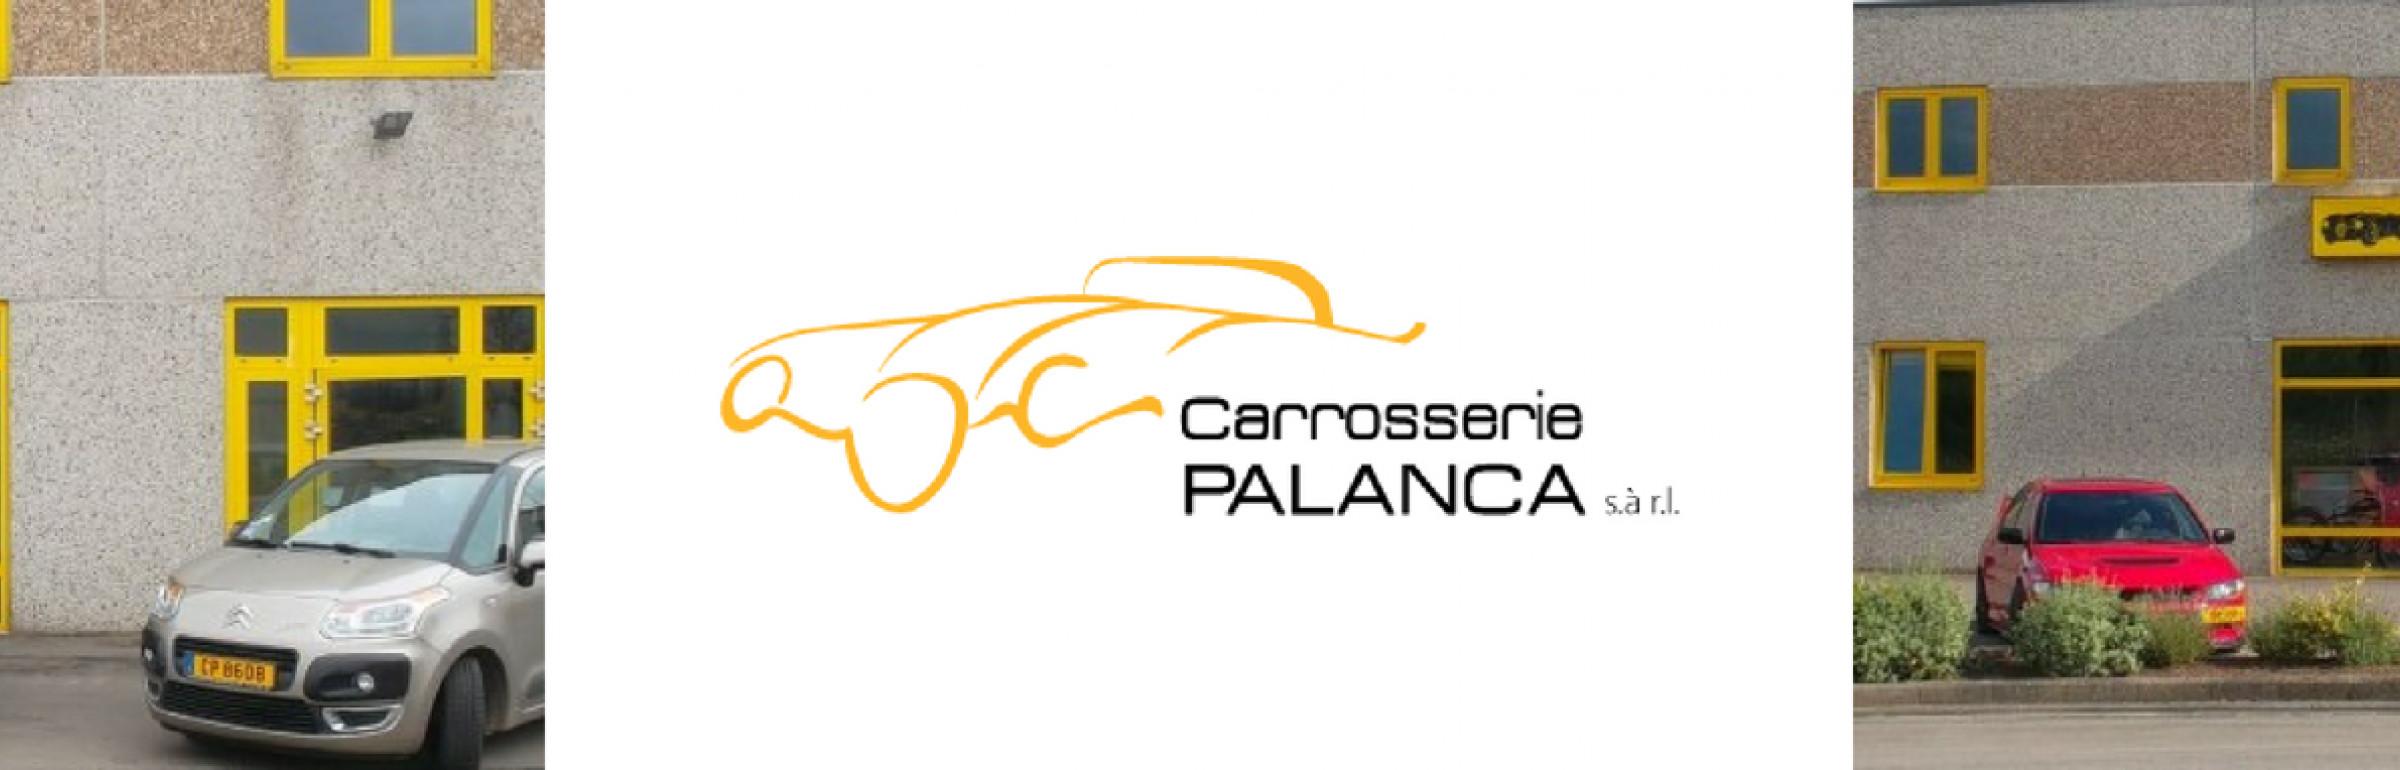 Banner Carrosserie Palanca